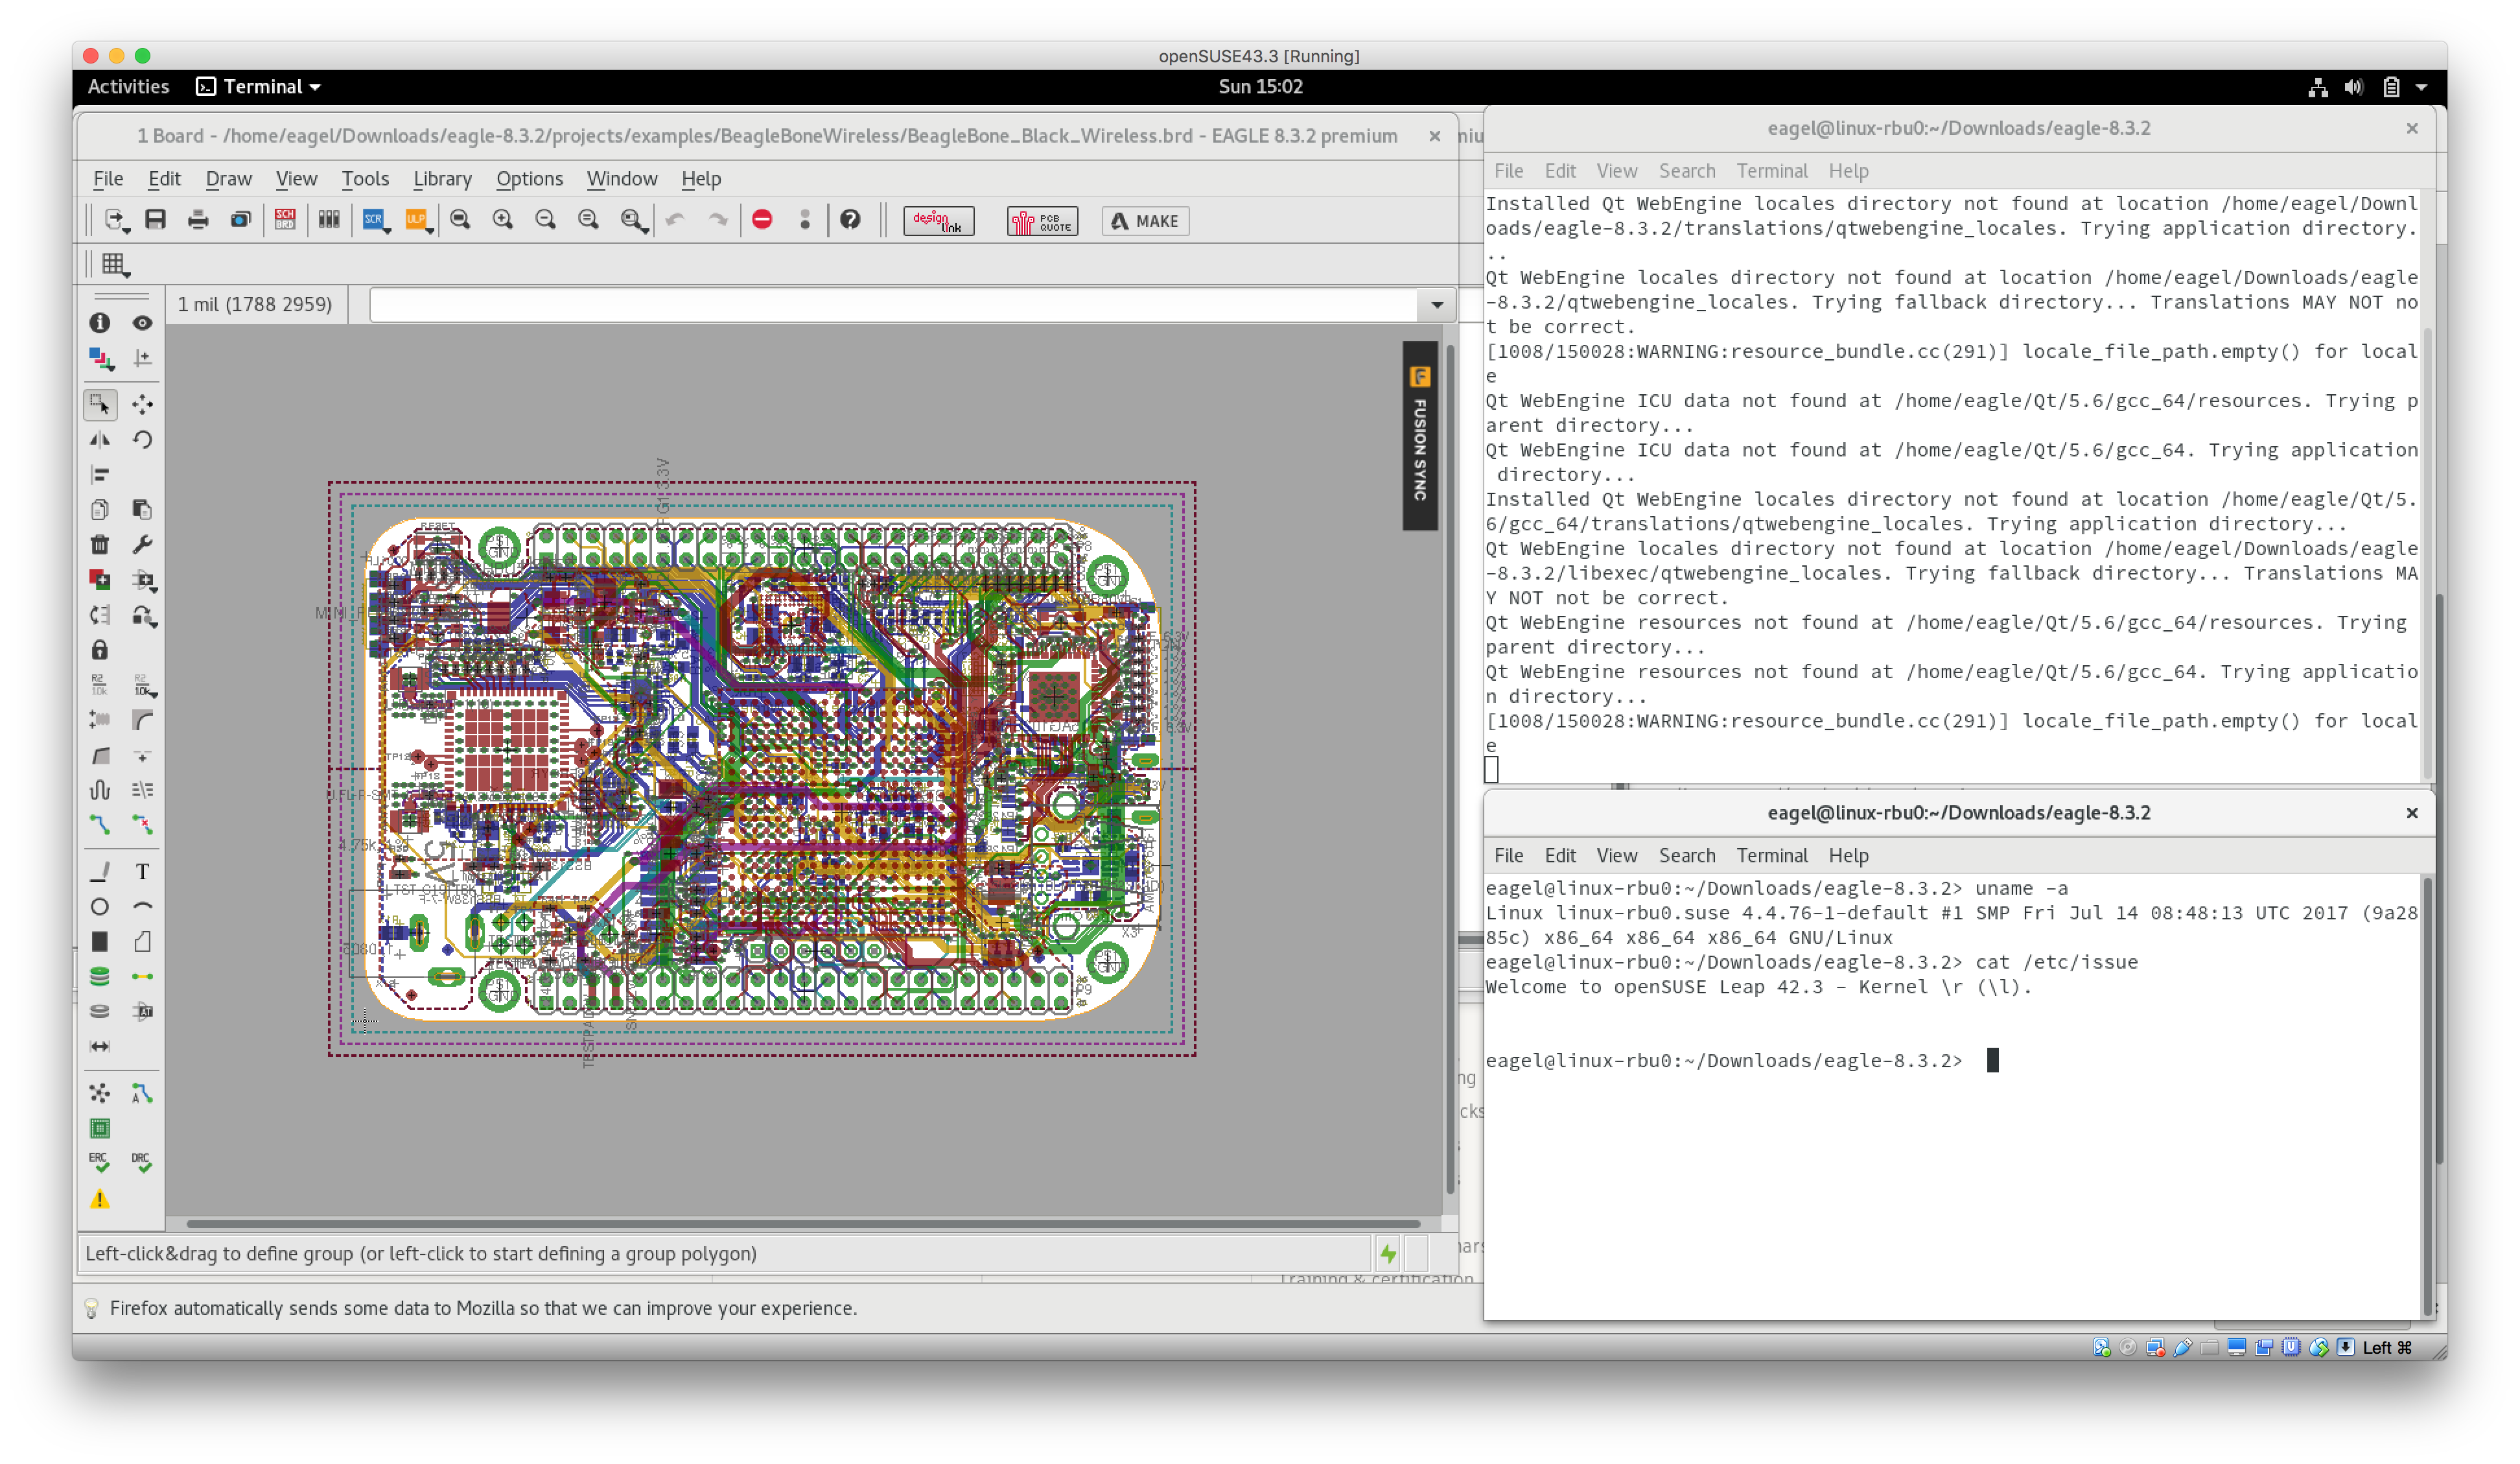 Cannot run EAGLE 8.3.2 on Ubuntu 17.04 64-bit - Autodesk Community ...